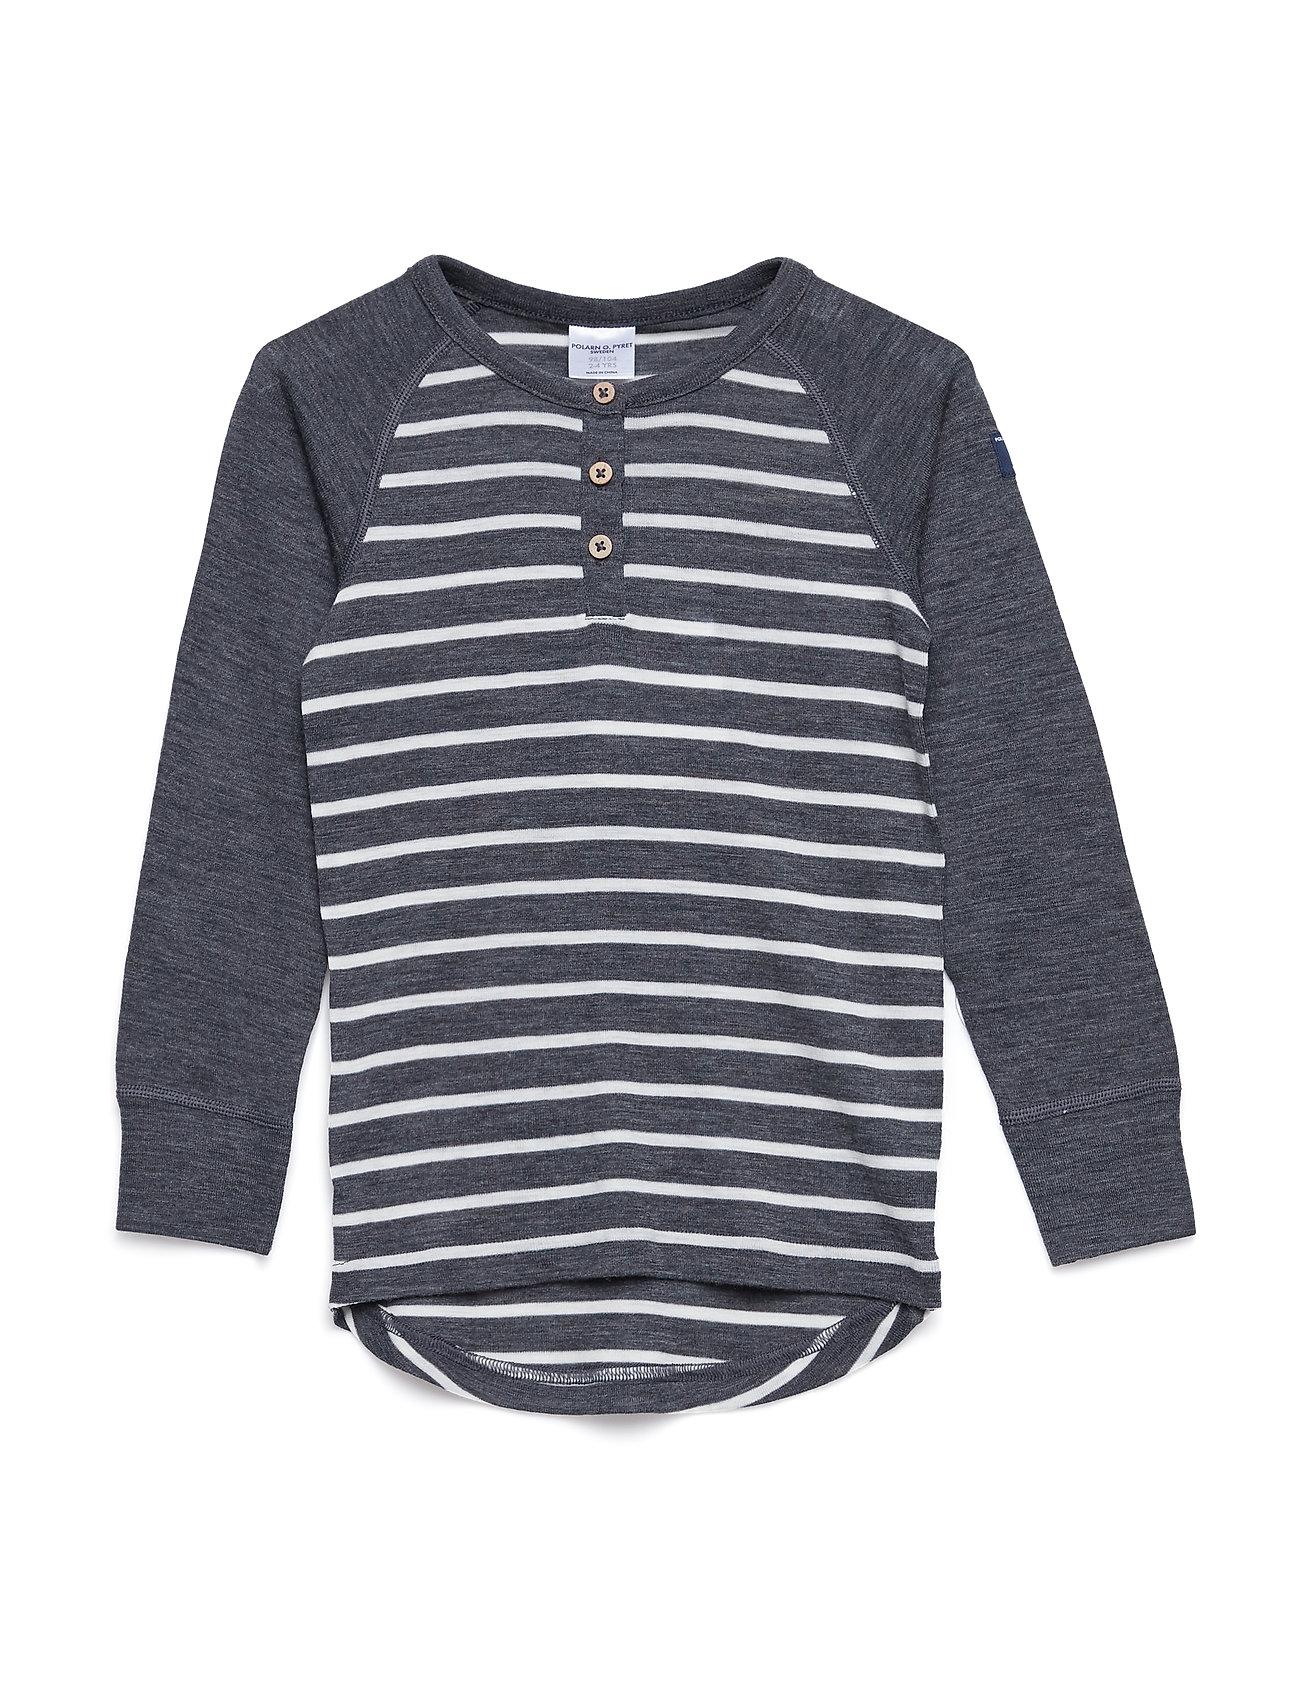 Polarn O. Pyret Sweater Wool Striped PreSchool